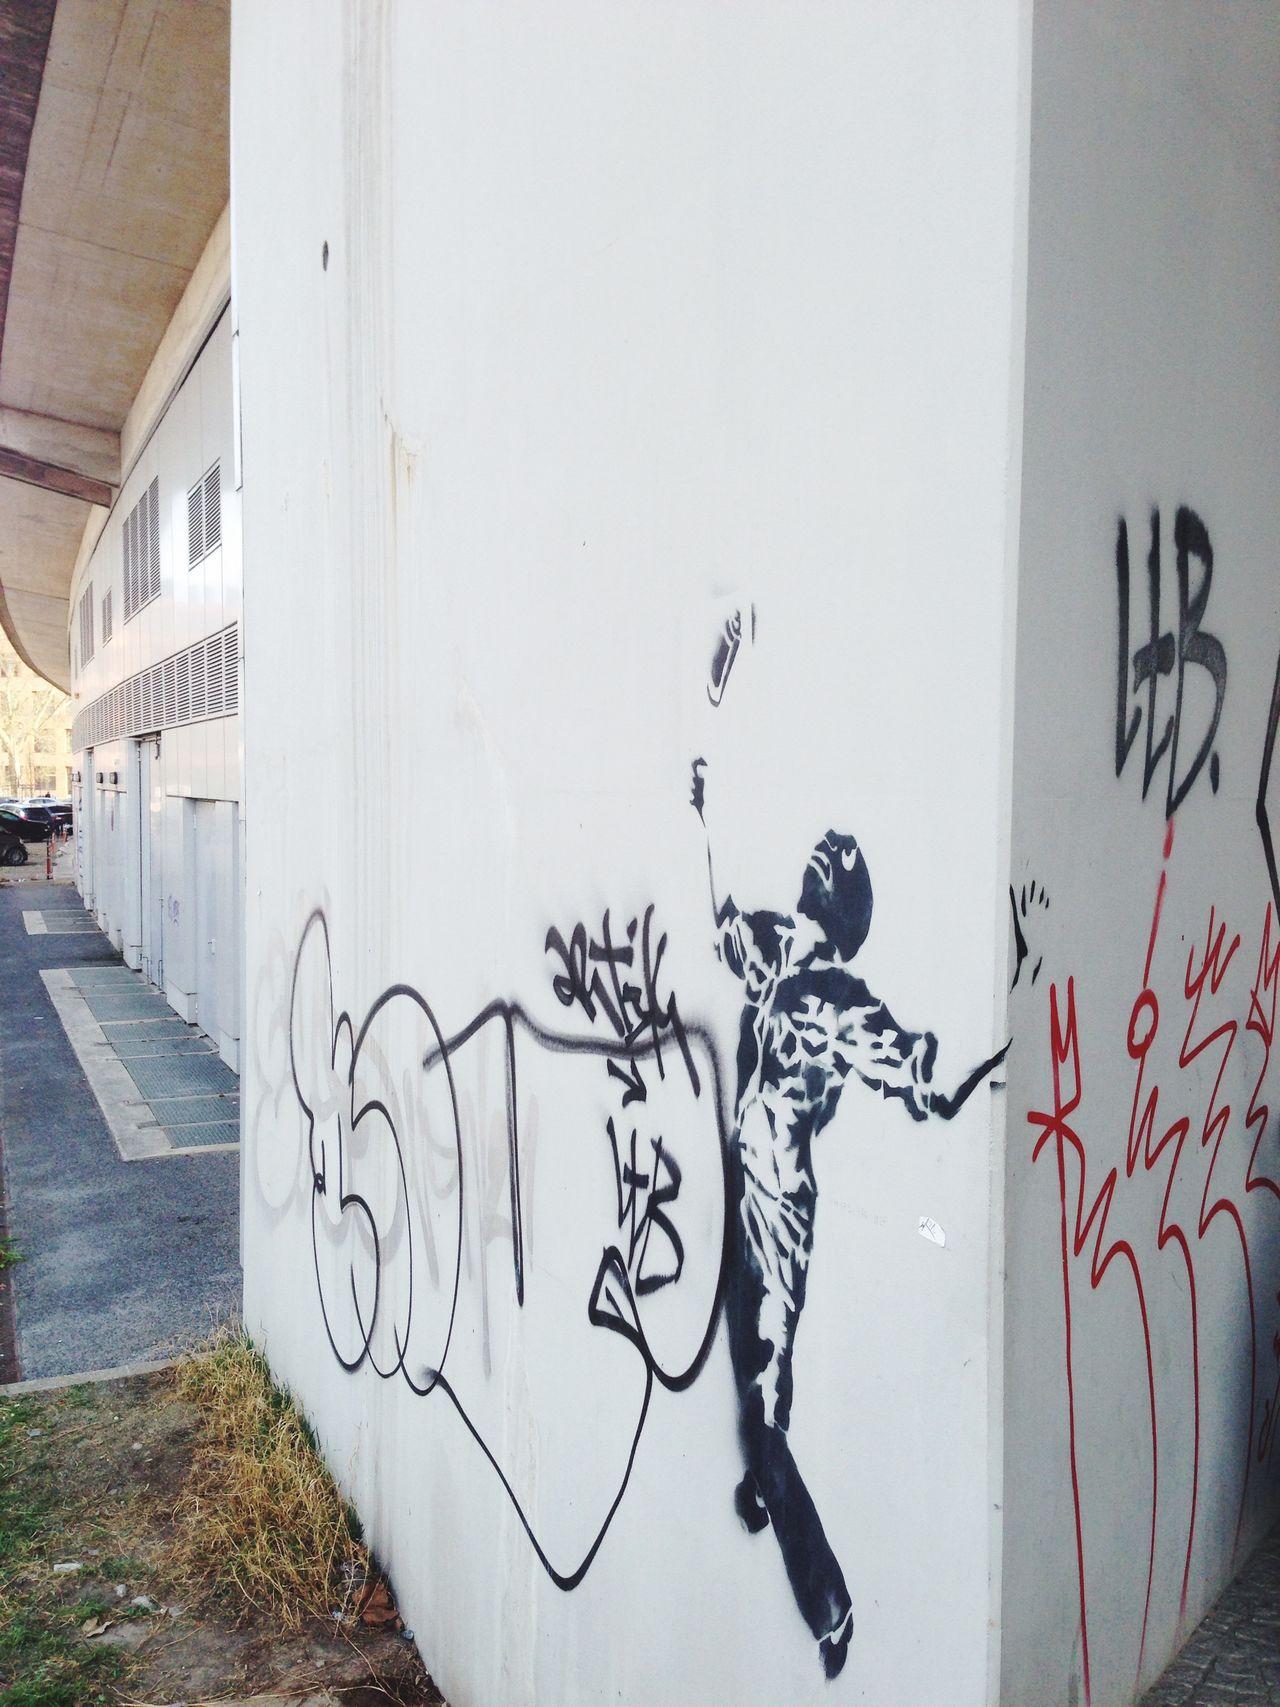 Graffiti Schablone Stencil Art Streetart Masked Spray Can